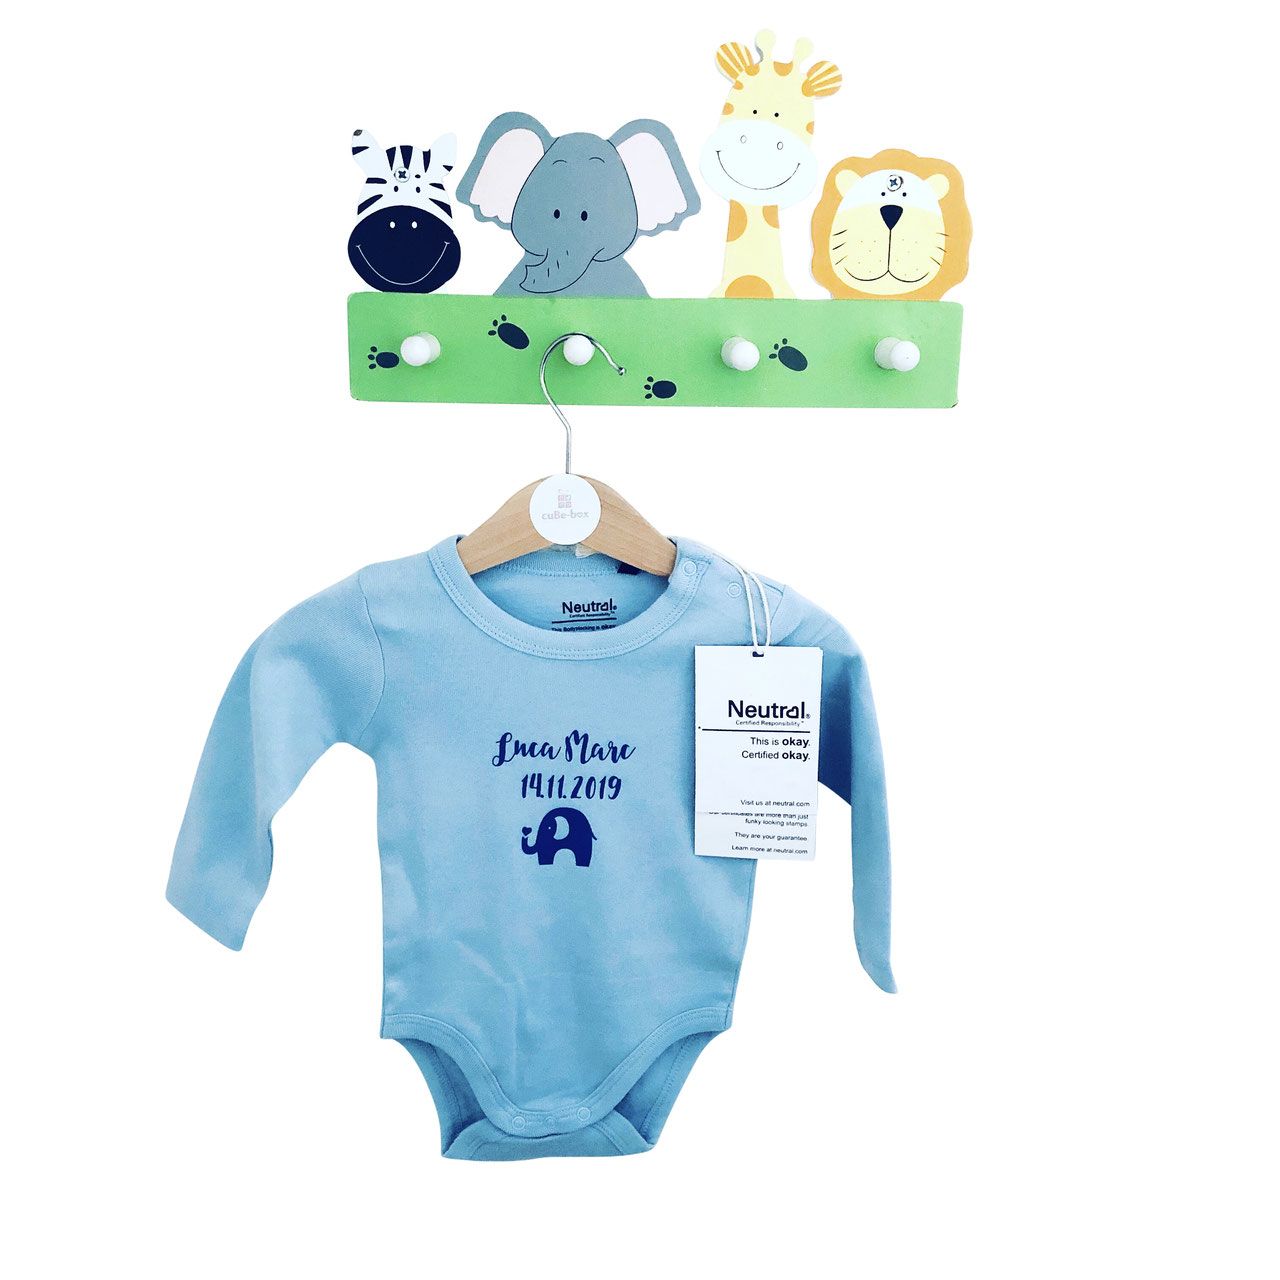 cuBe-box-Babygeschenke-body-blau-garderobe